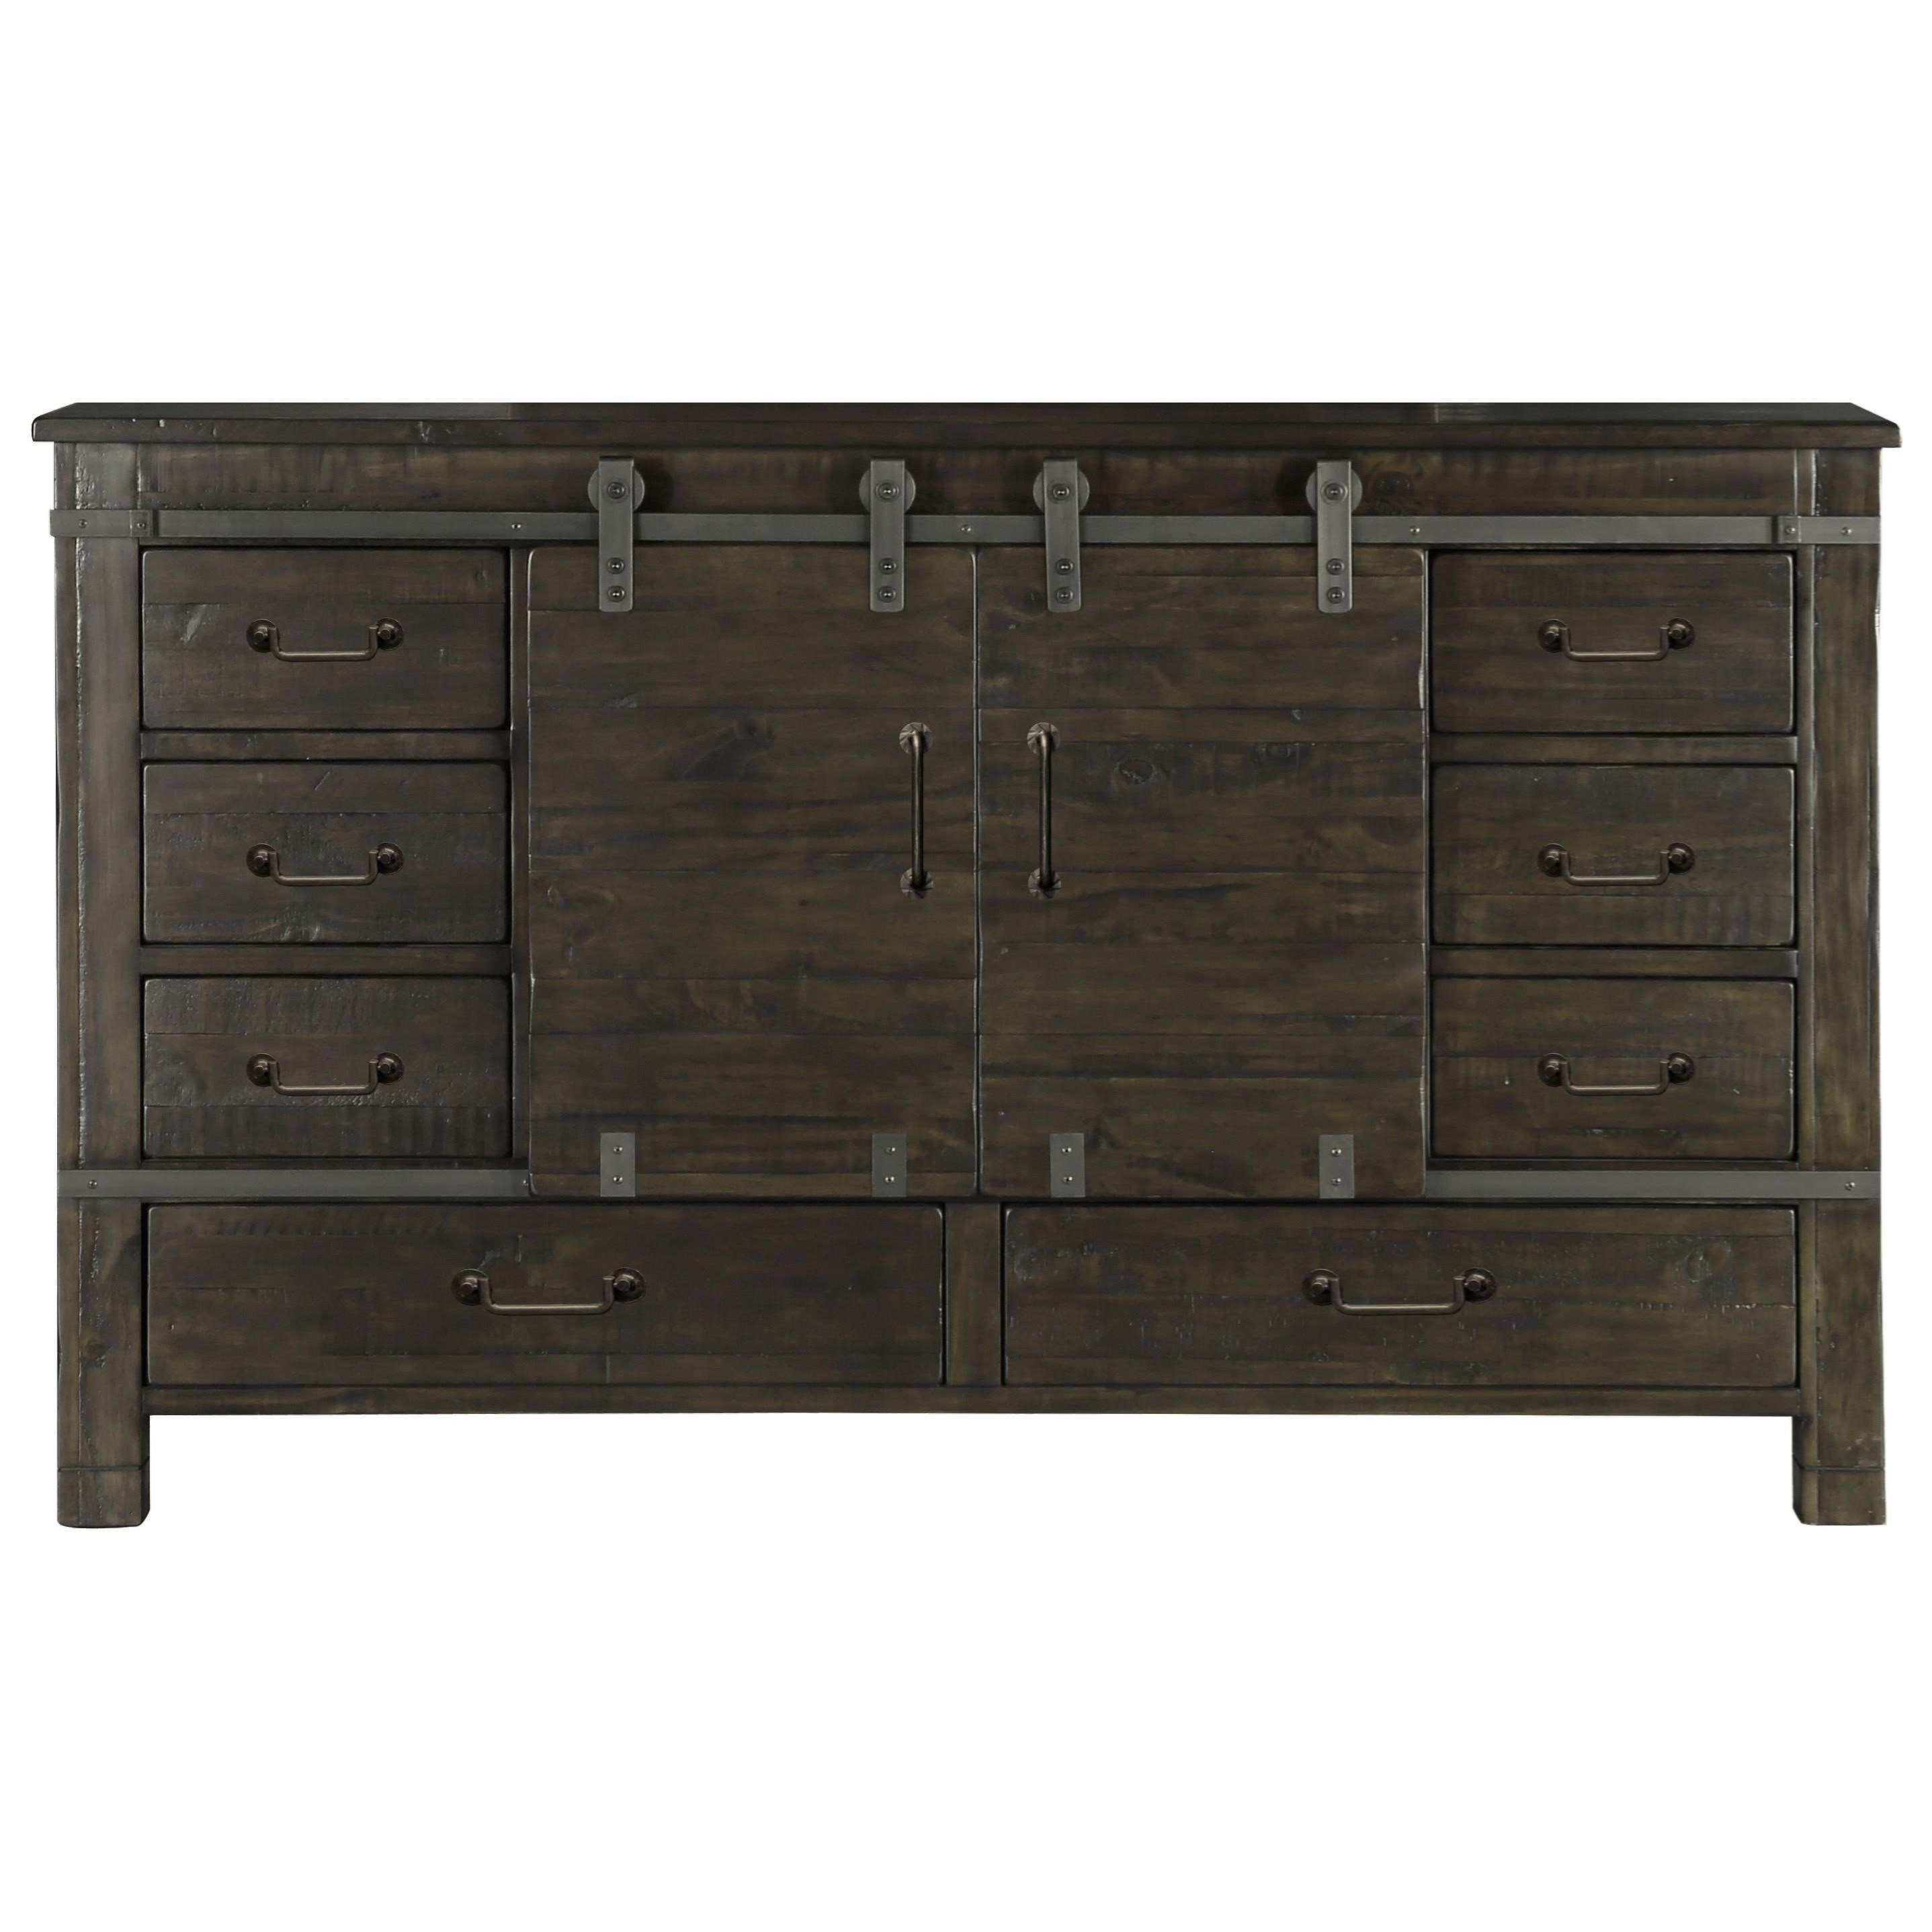 Abington Sliding Door Dresser by Magnussen Home at Stoney Creek Furniture